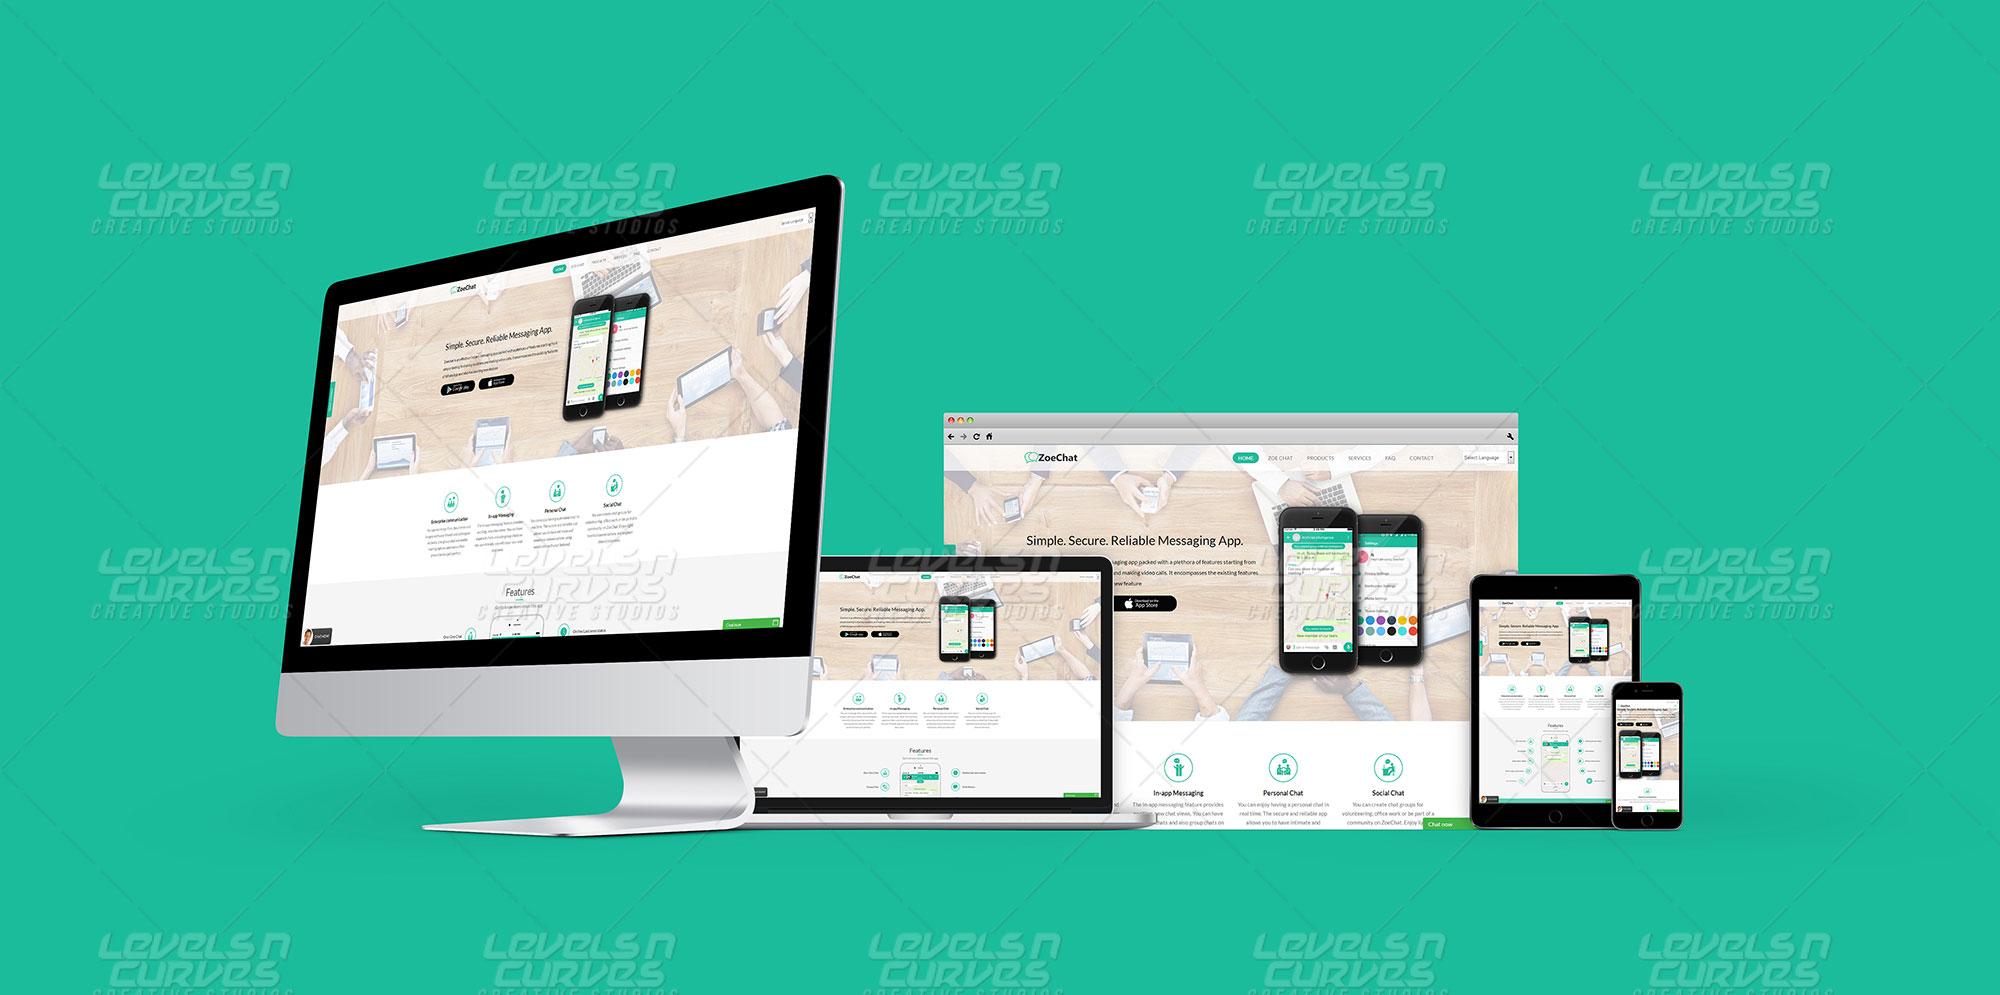 mobile app development in Chennai